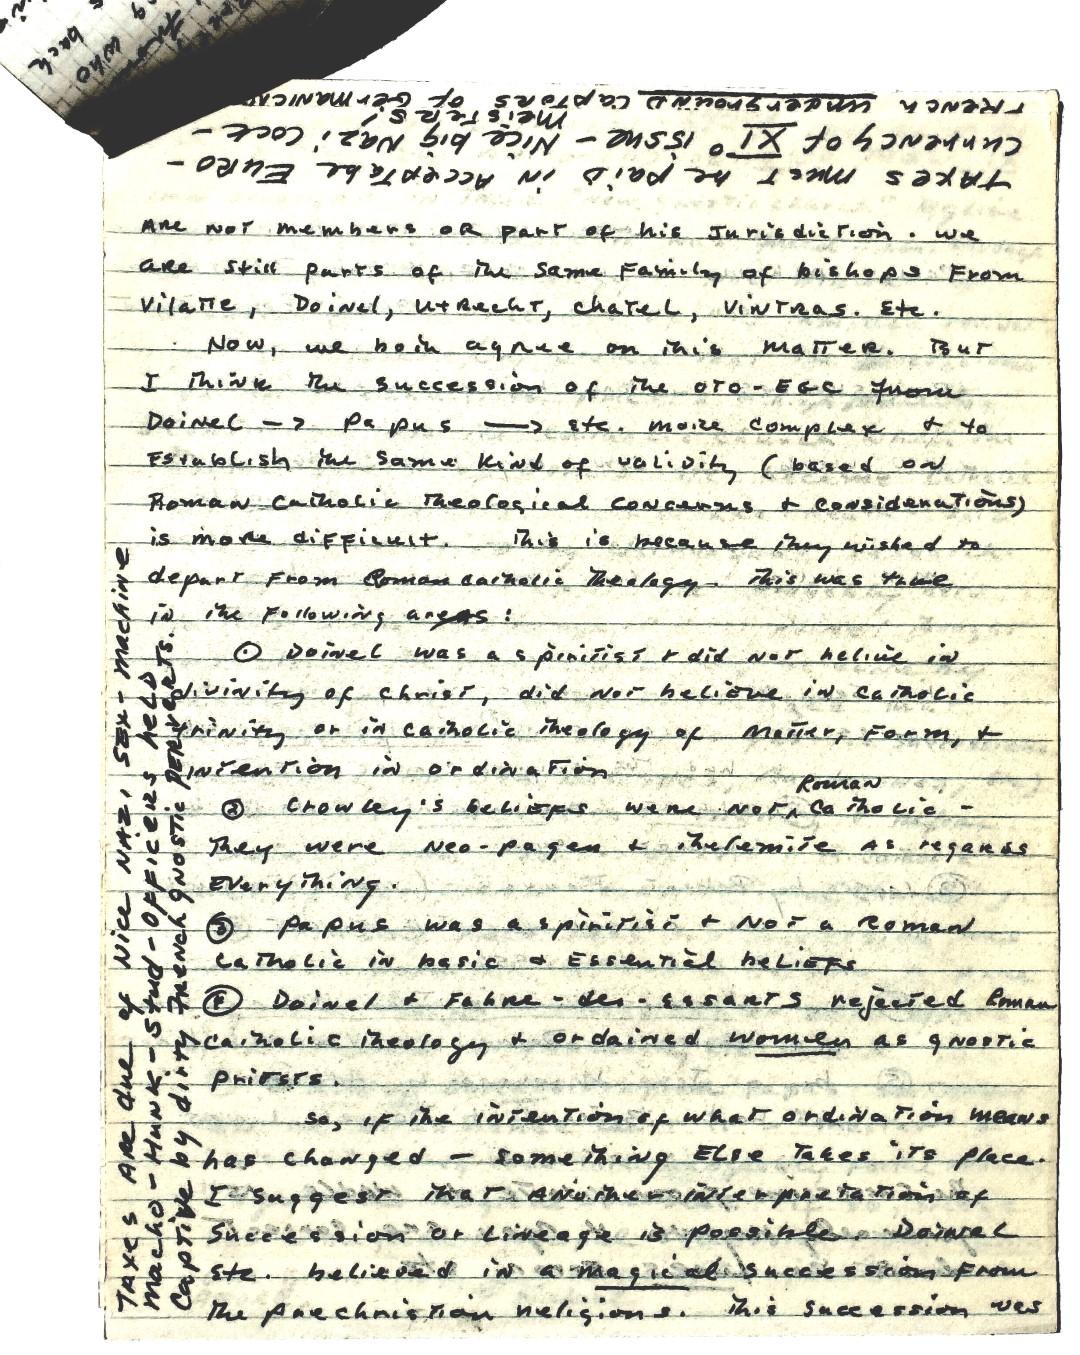 Michael Paul Bertiaux Ordo Templi Orientis Antiqua Choronzon Club Peter-Robert Koenig 1989-01-10